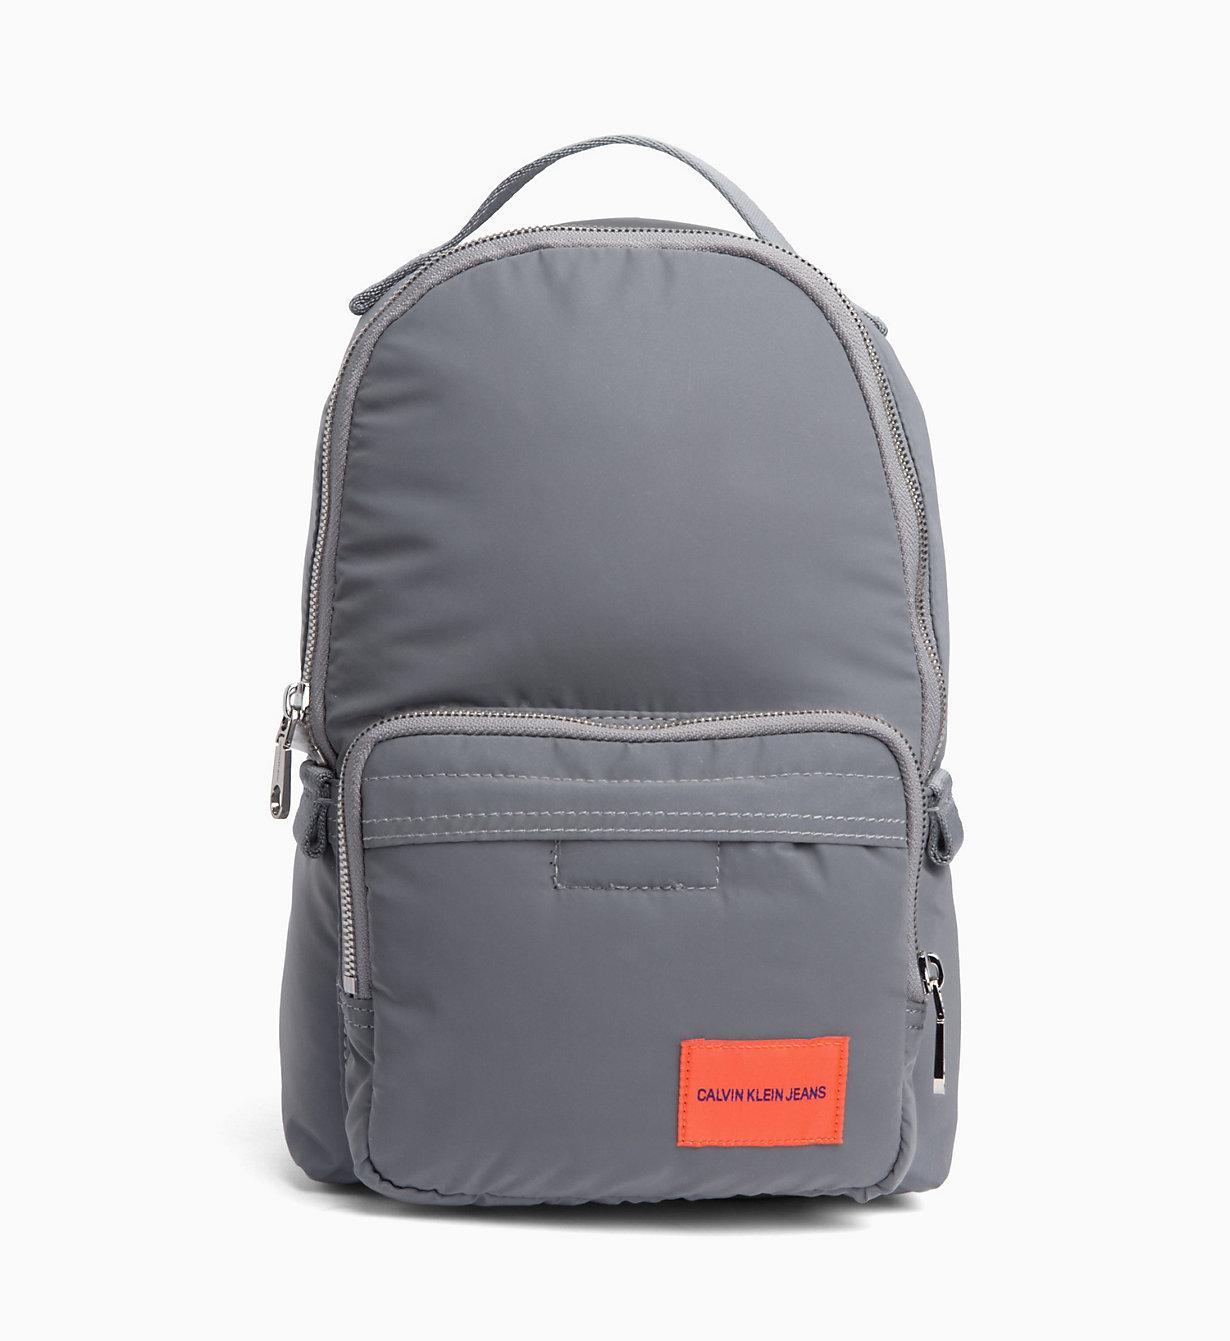 Medium Reflective Nylon Backpack by Calvin Klein Jeans